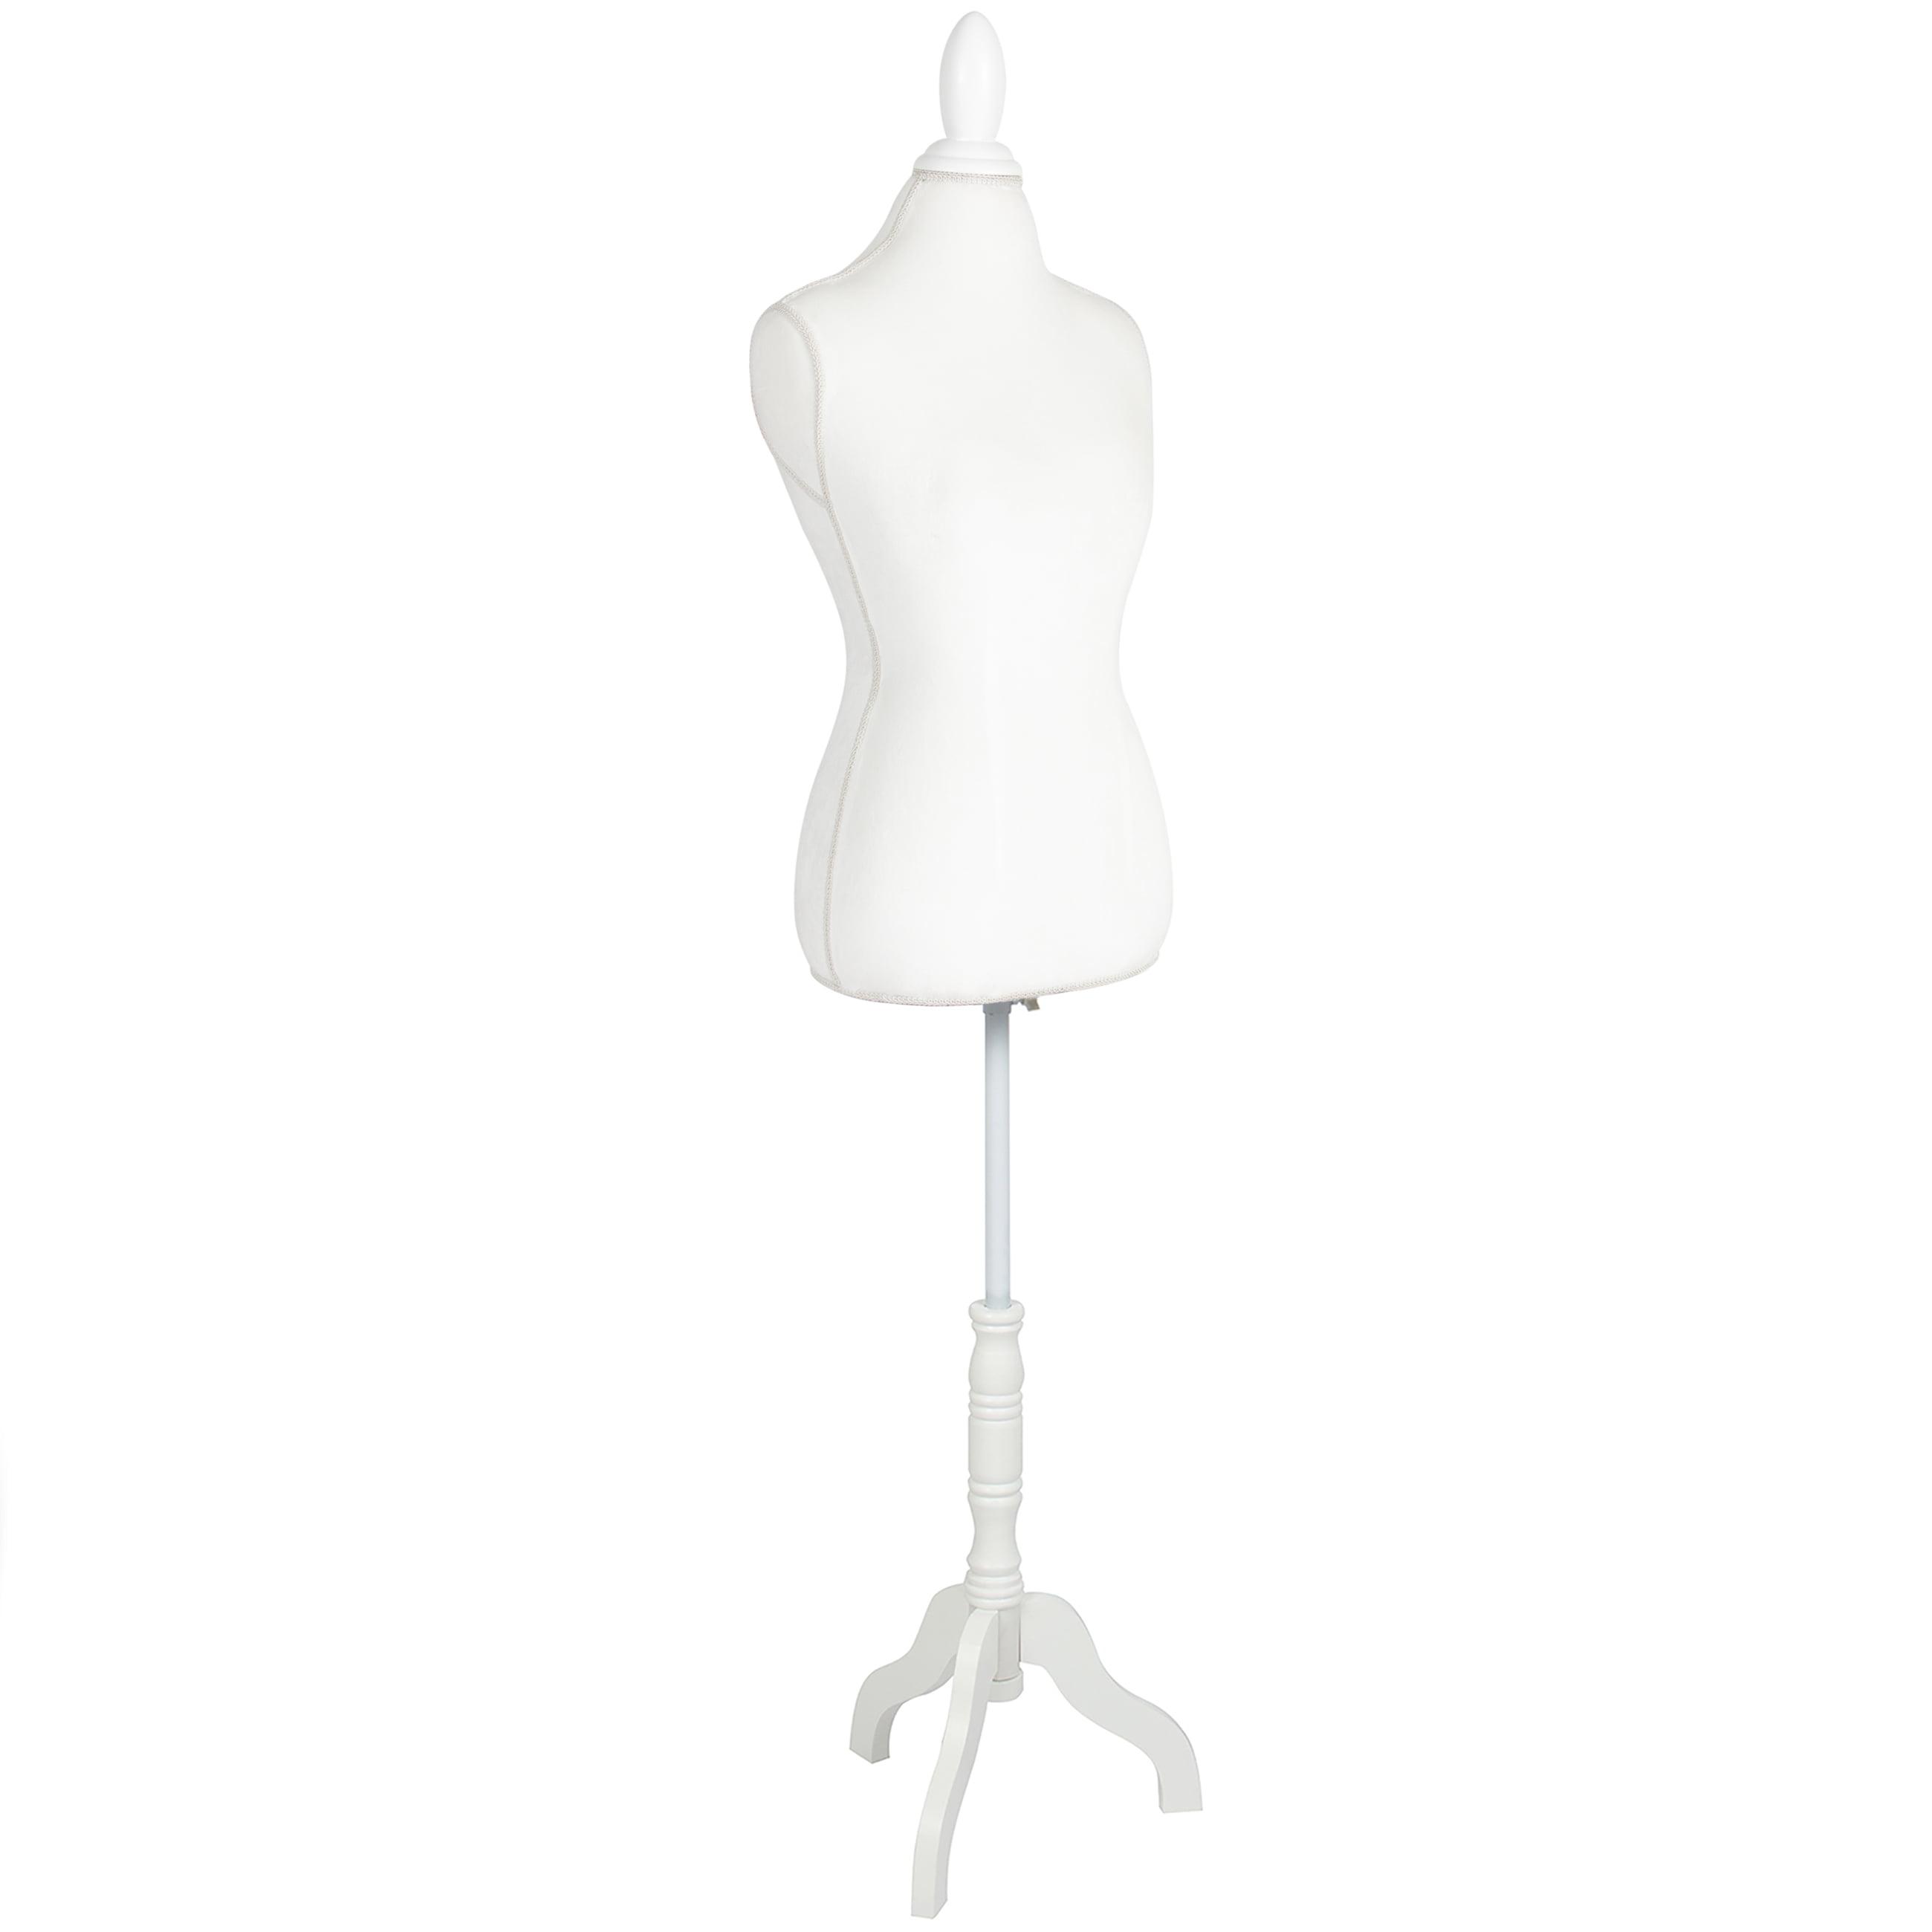 White Female Mannequin Torso Dress Form Display W/ White Tripod ...